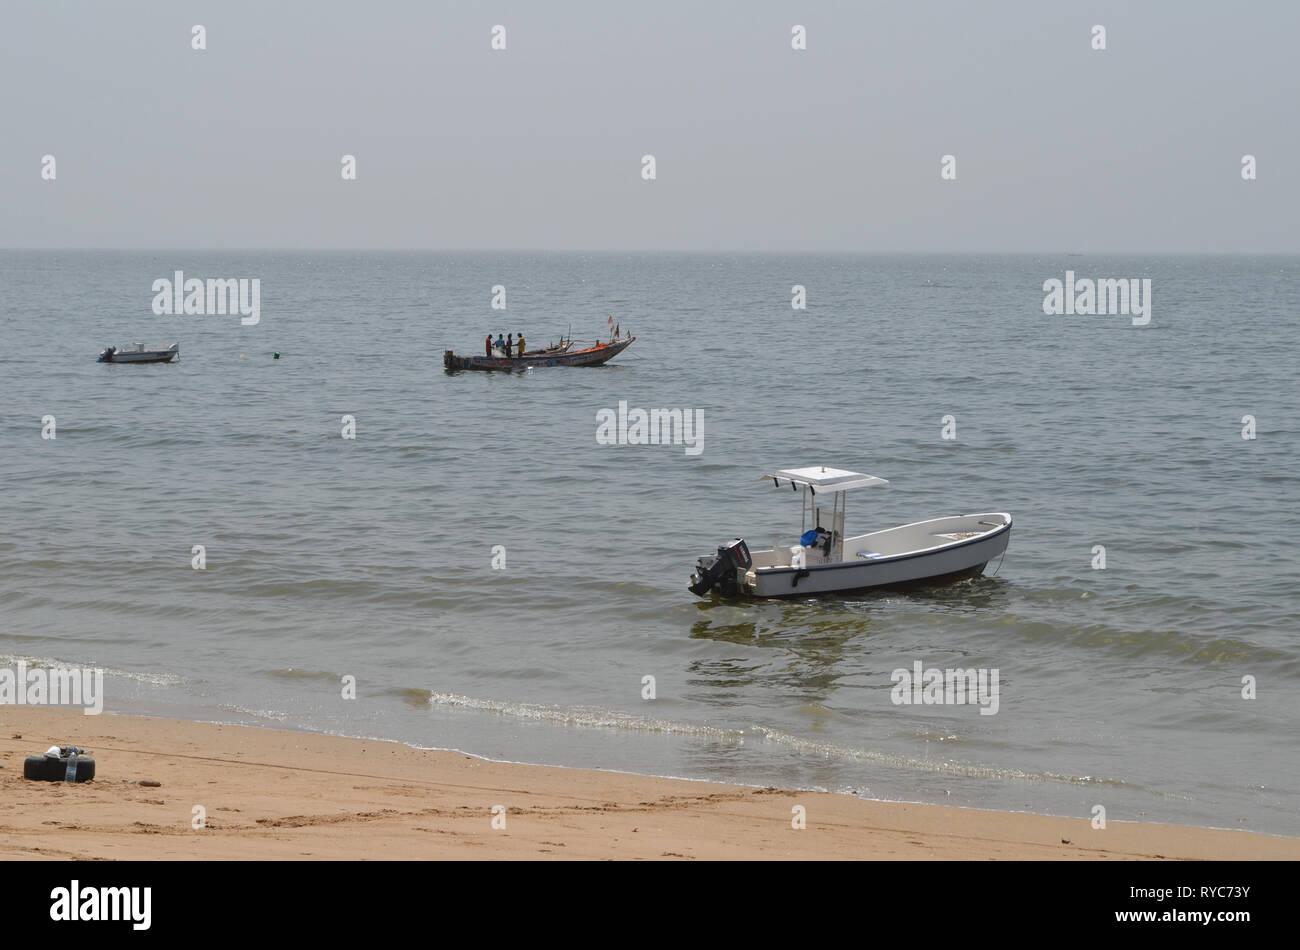 Piraguas artesanales en la playa de Djiffère, Senegal Foto de stock